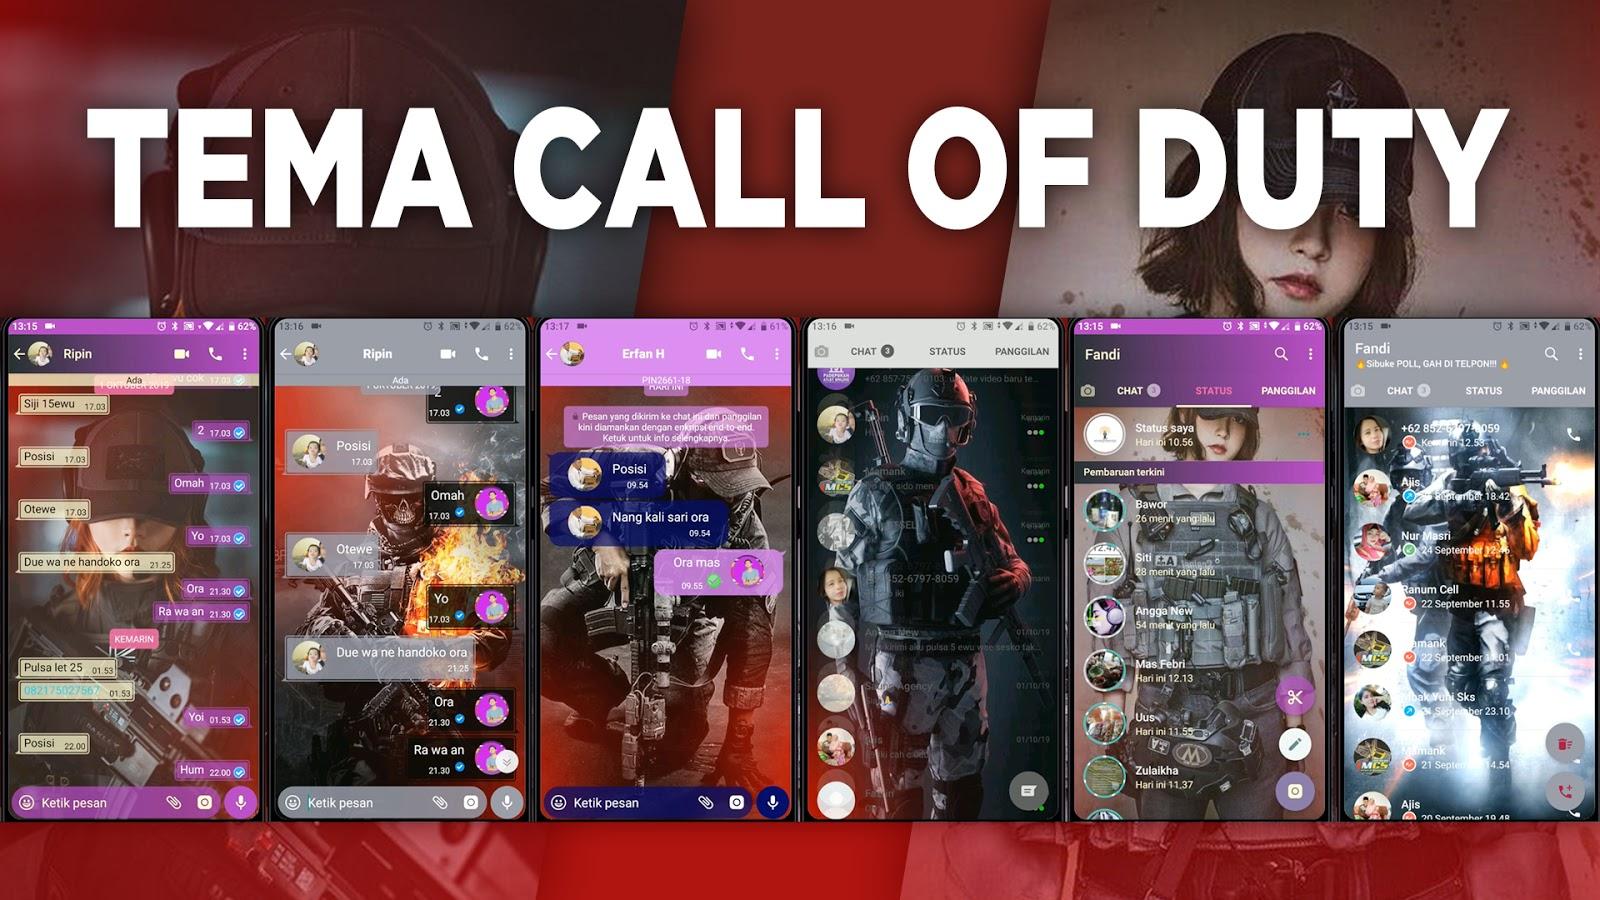 Download Kumpulan Tema Whatsapp Game COD Call Of Duty ...